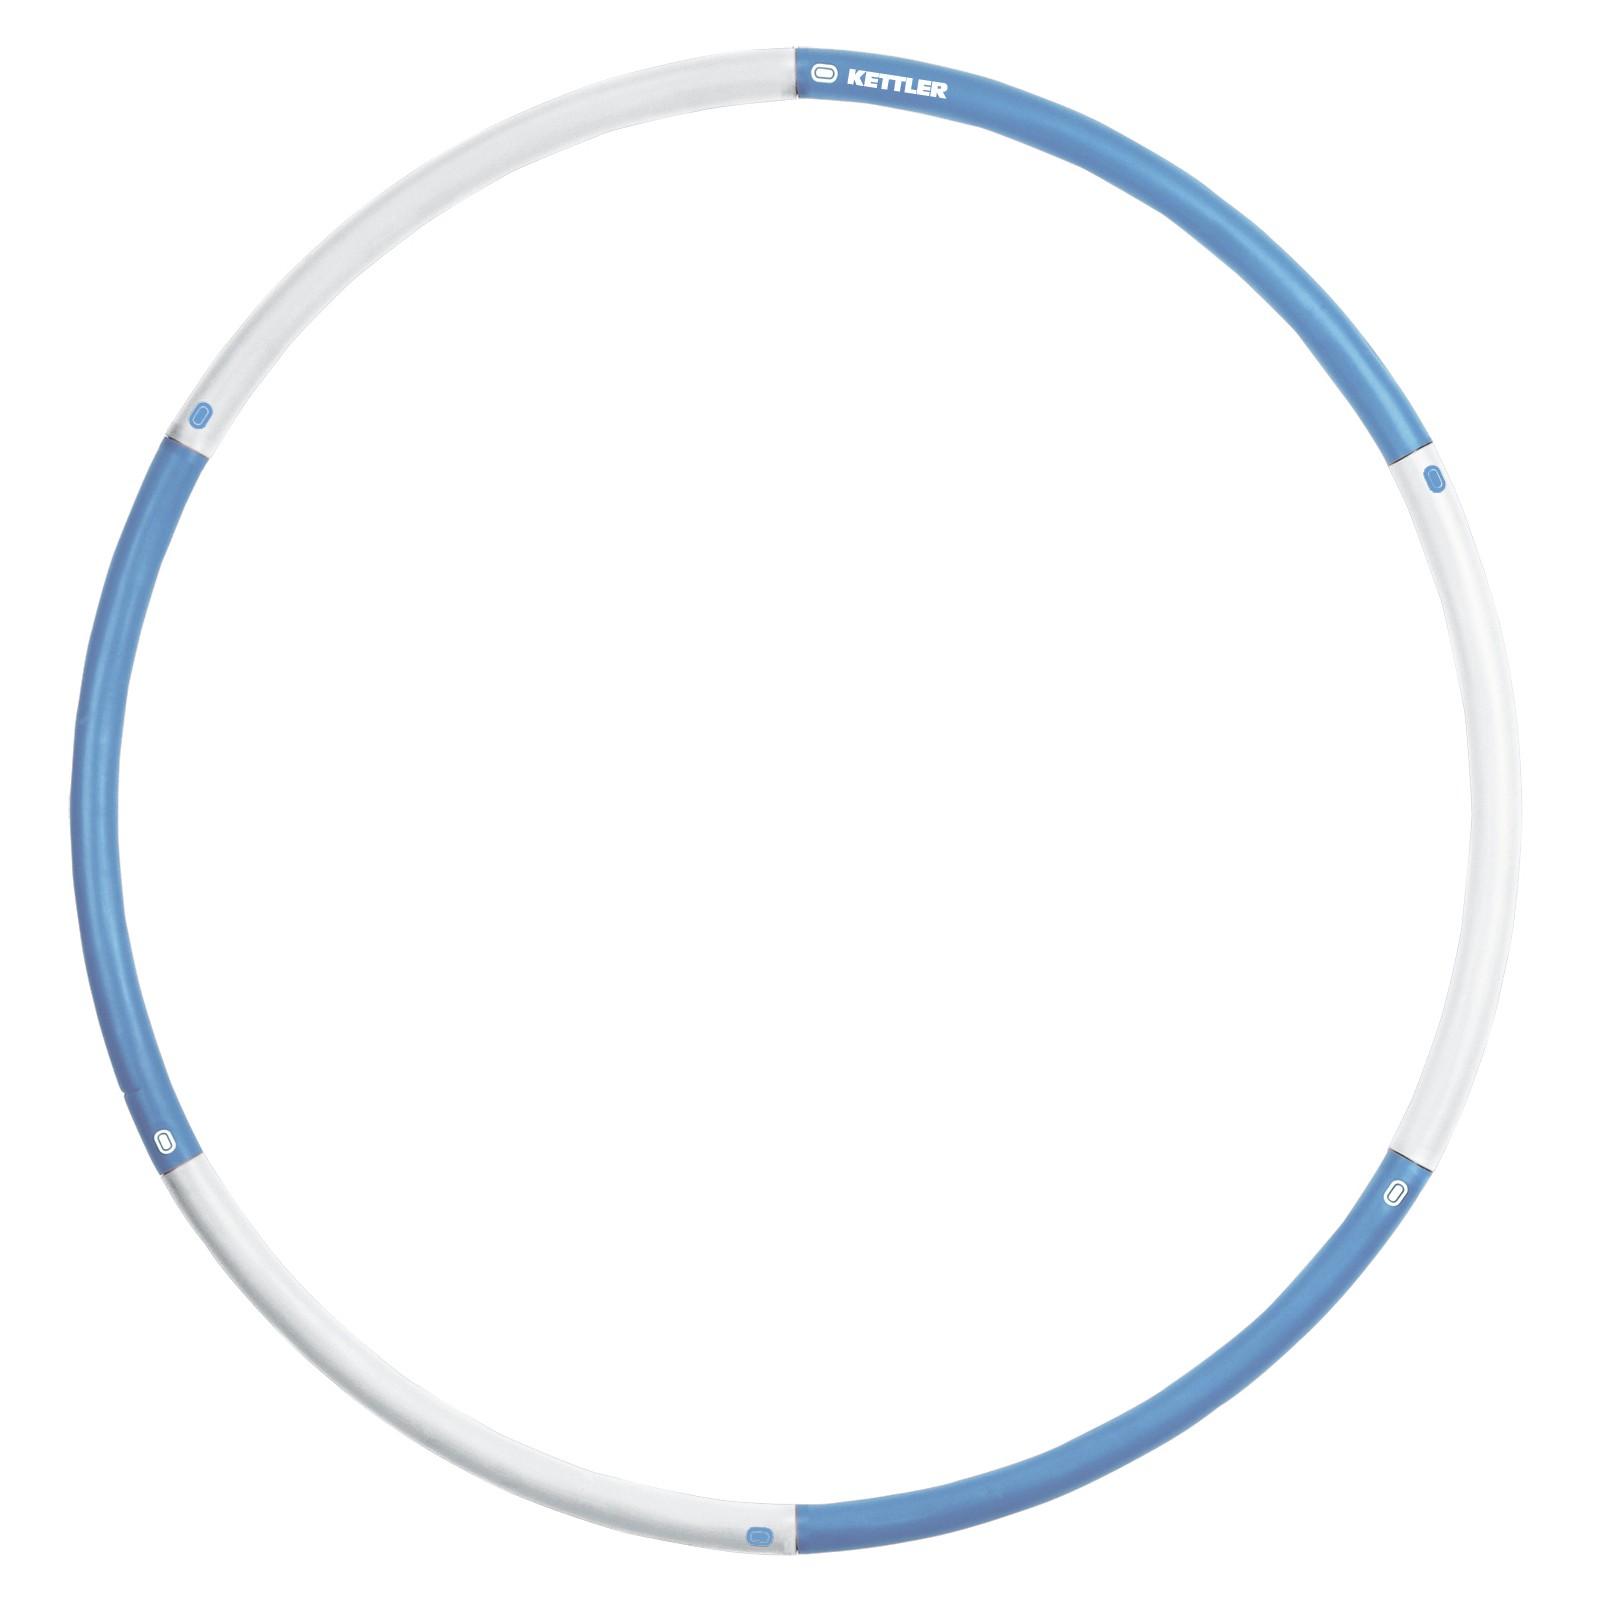 kettler hula hoop reifen kaufen test sport tiedje. Black Bedroom Furniture Sets. Home Design Ideas